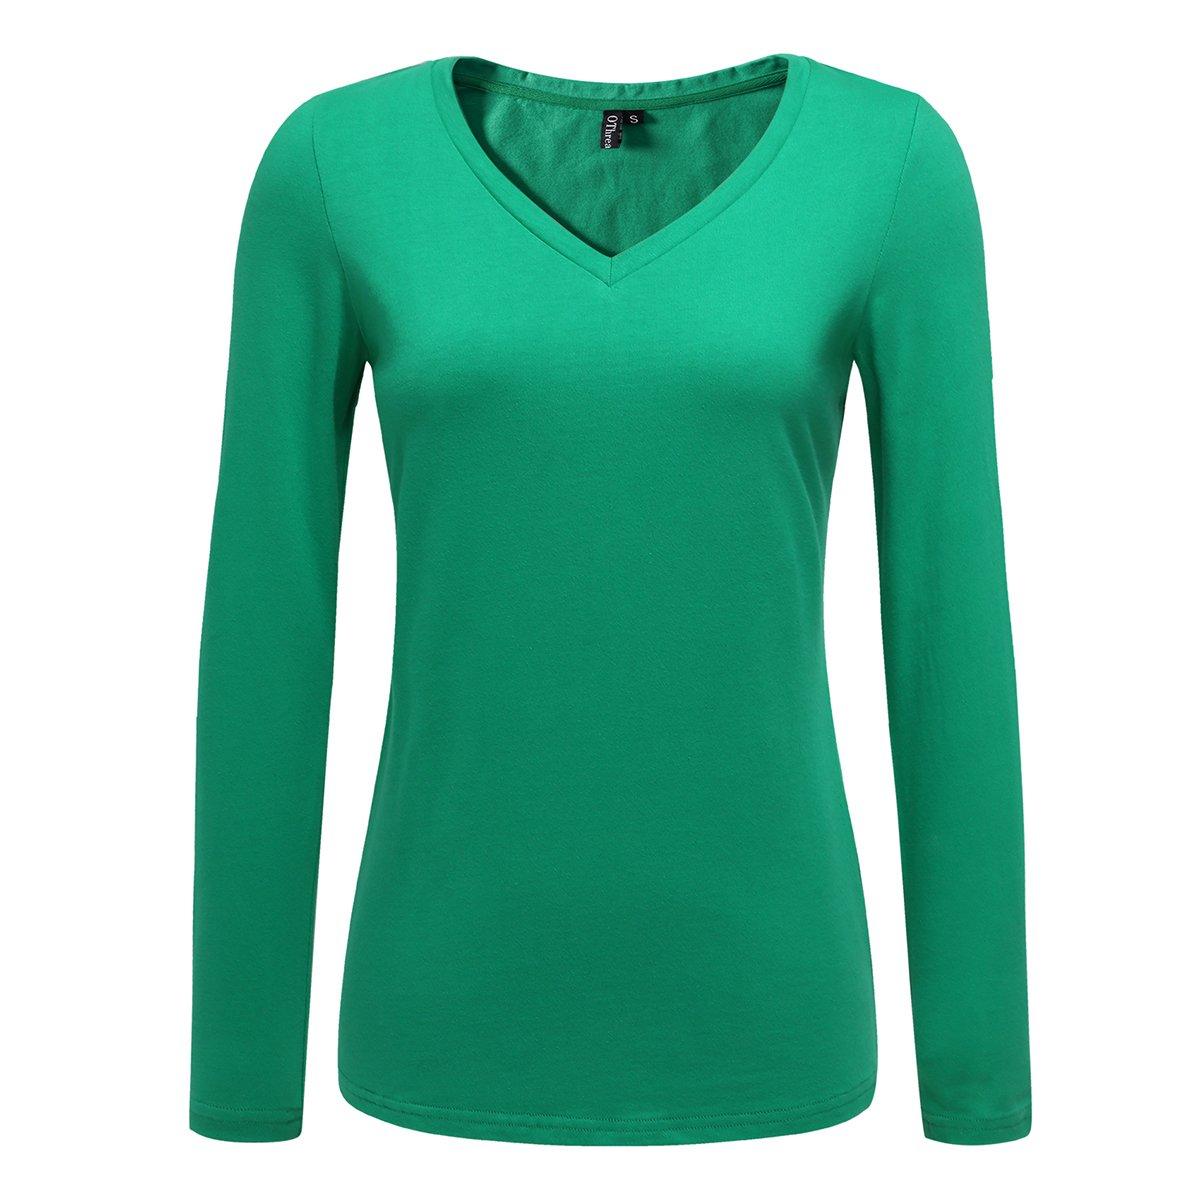 OThread & Co. Women's Long Sleeve T-Shirt 100% Cotton Basic Casual V-Neck Tee (Large, Green)